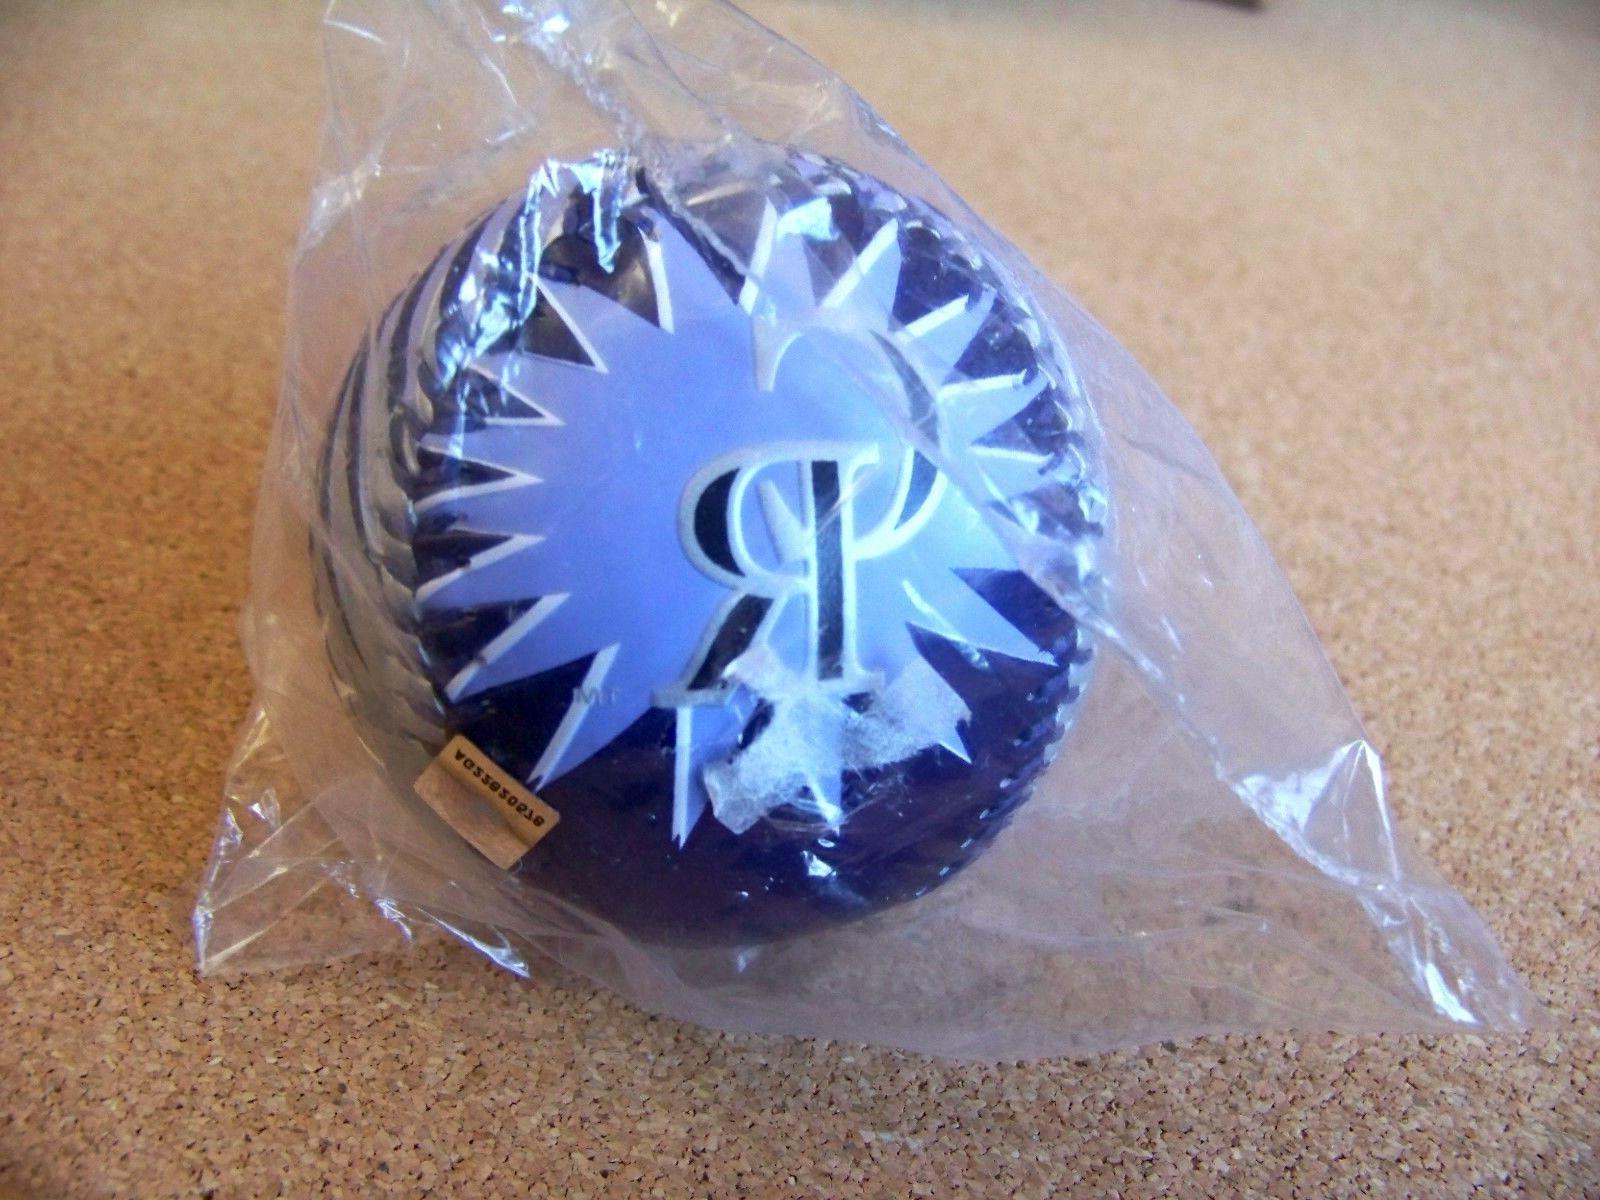 2006 Diamondbacks ball